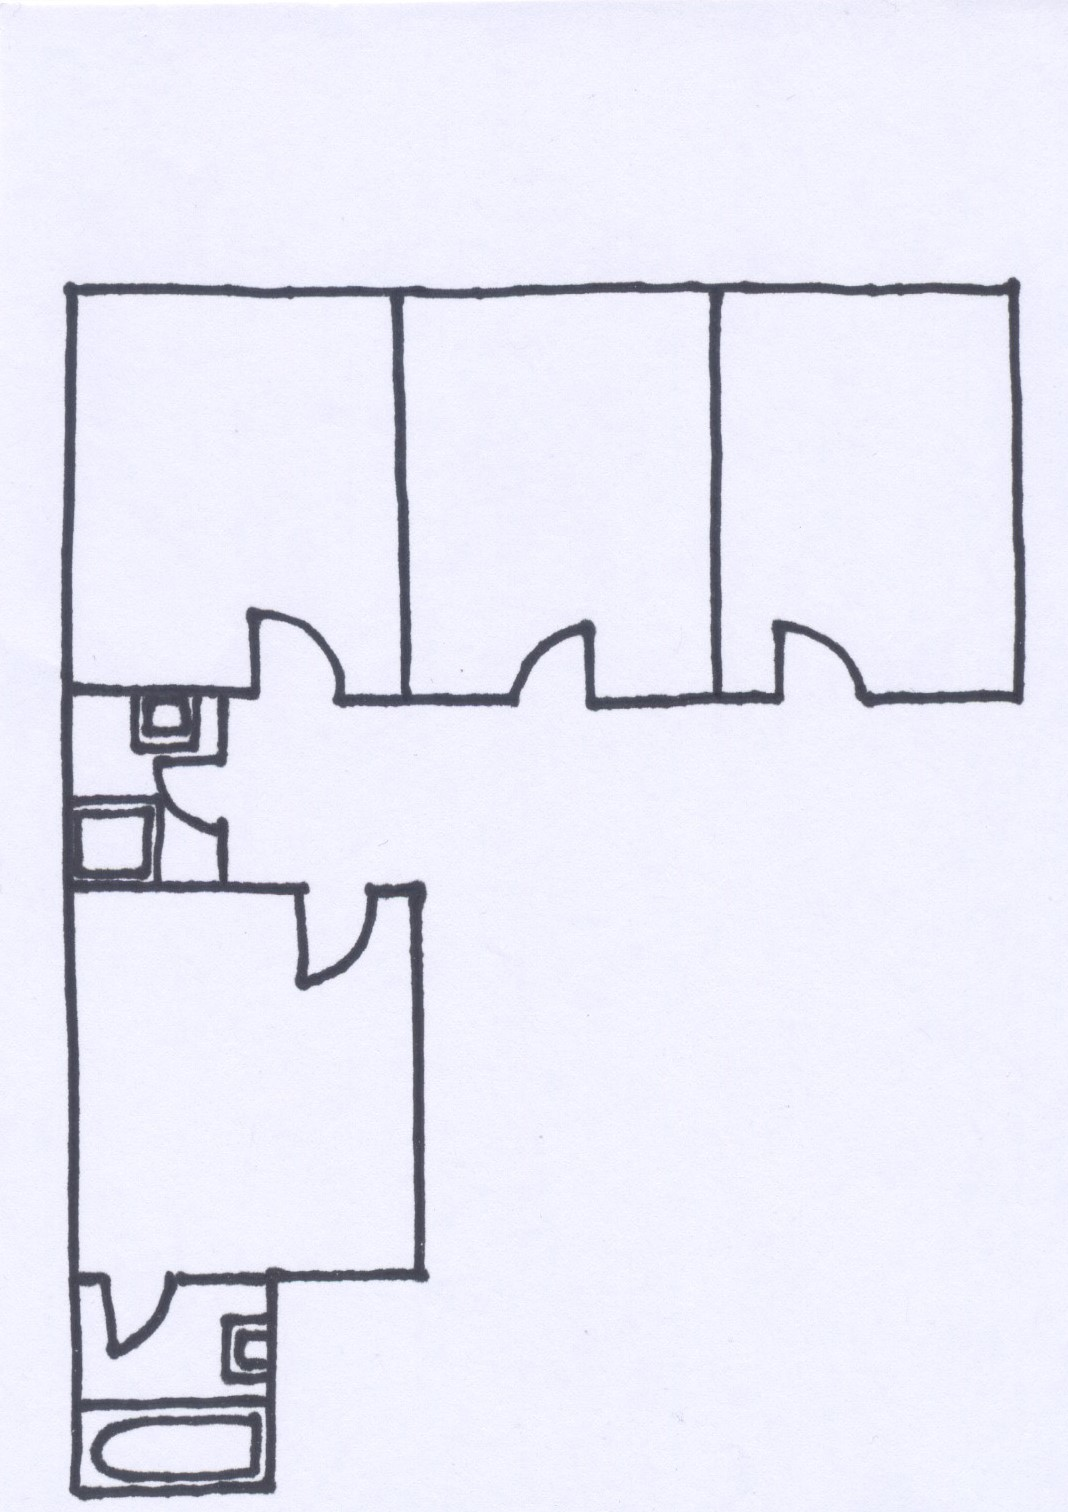 W22-4